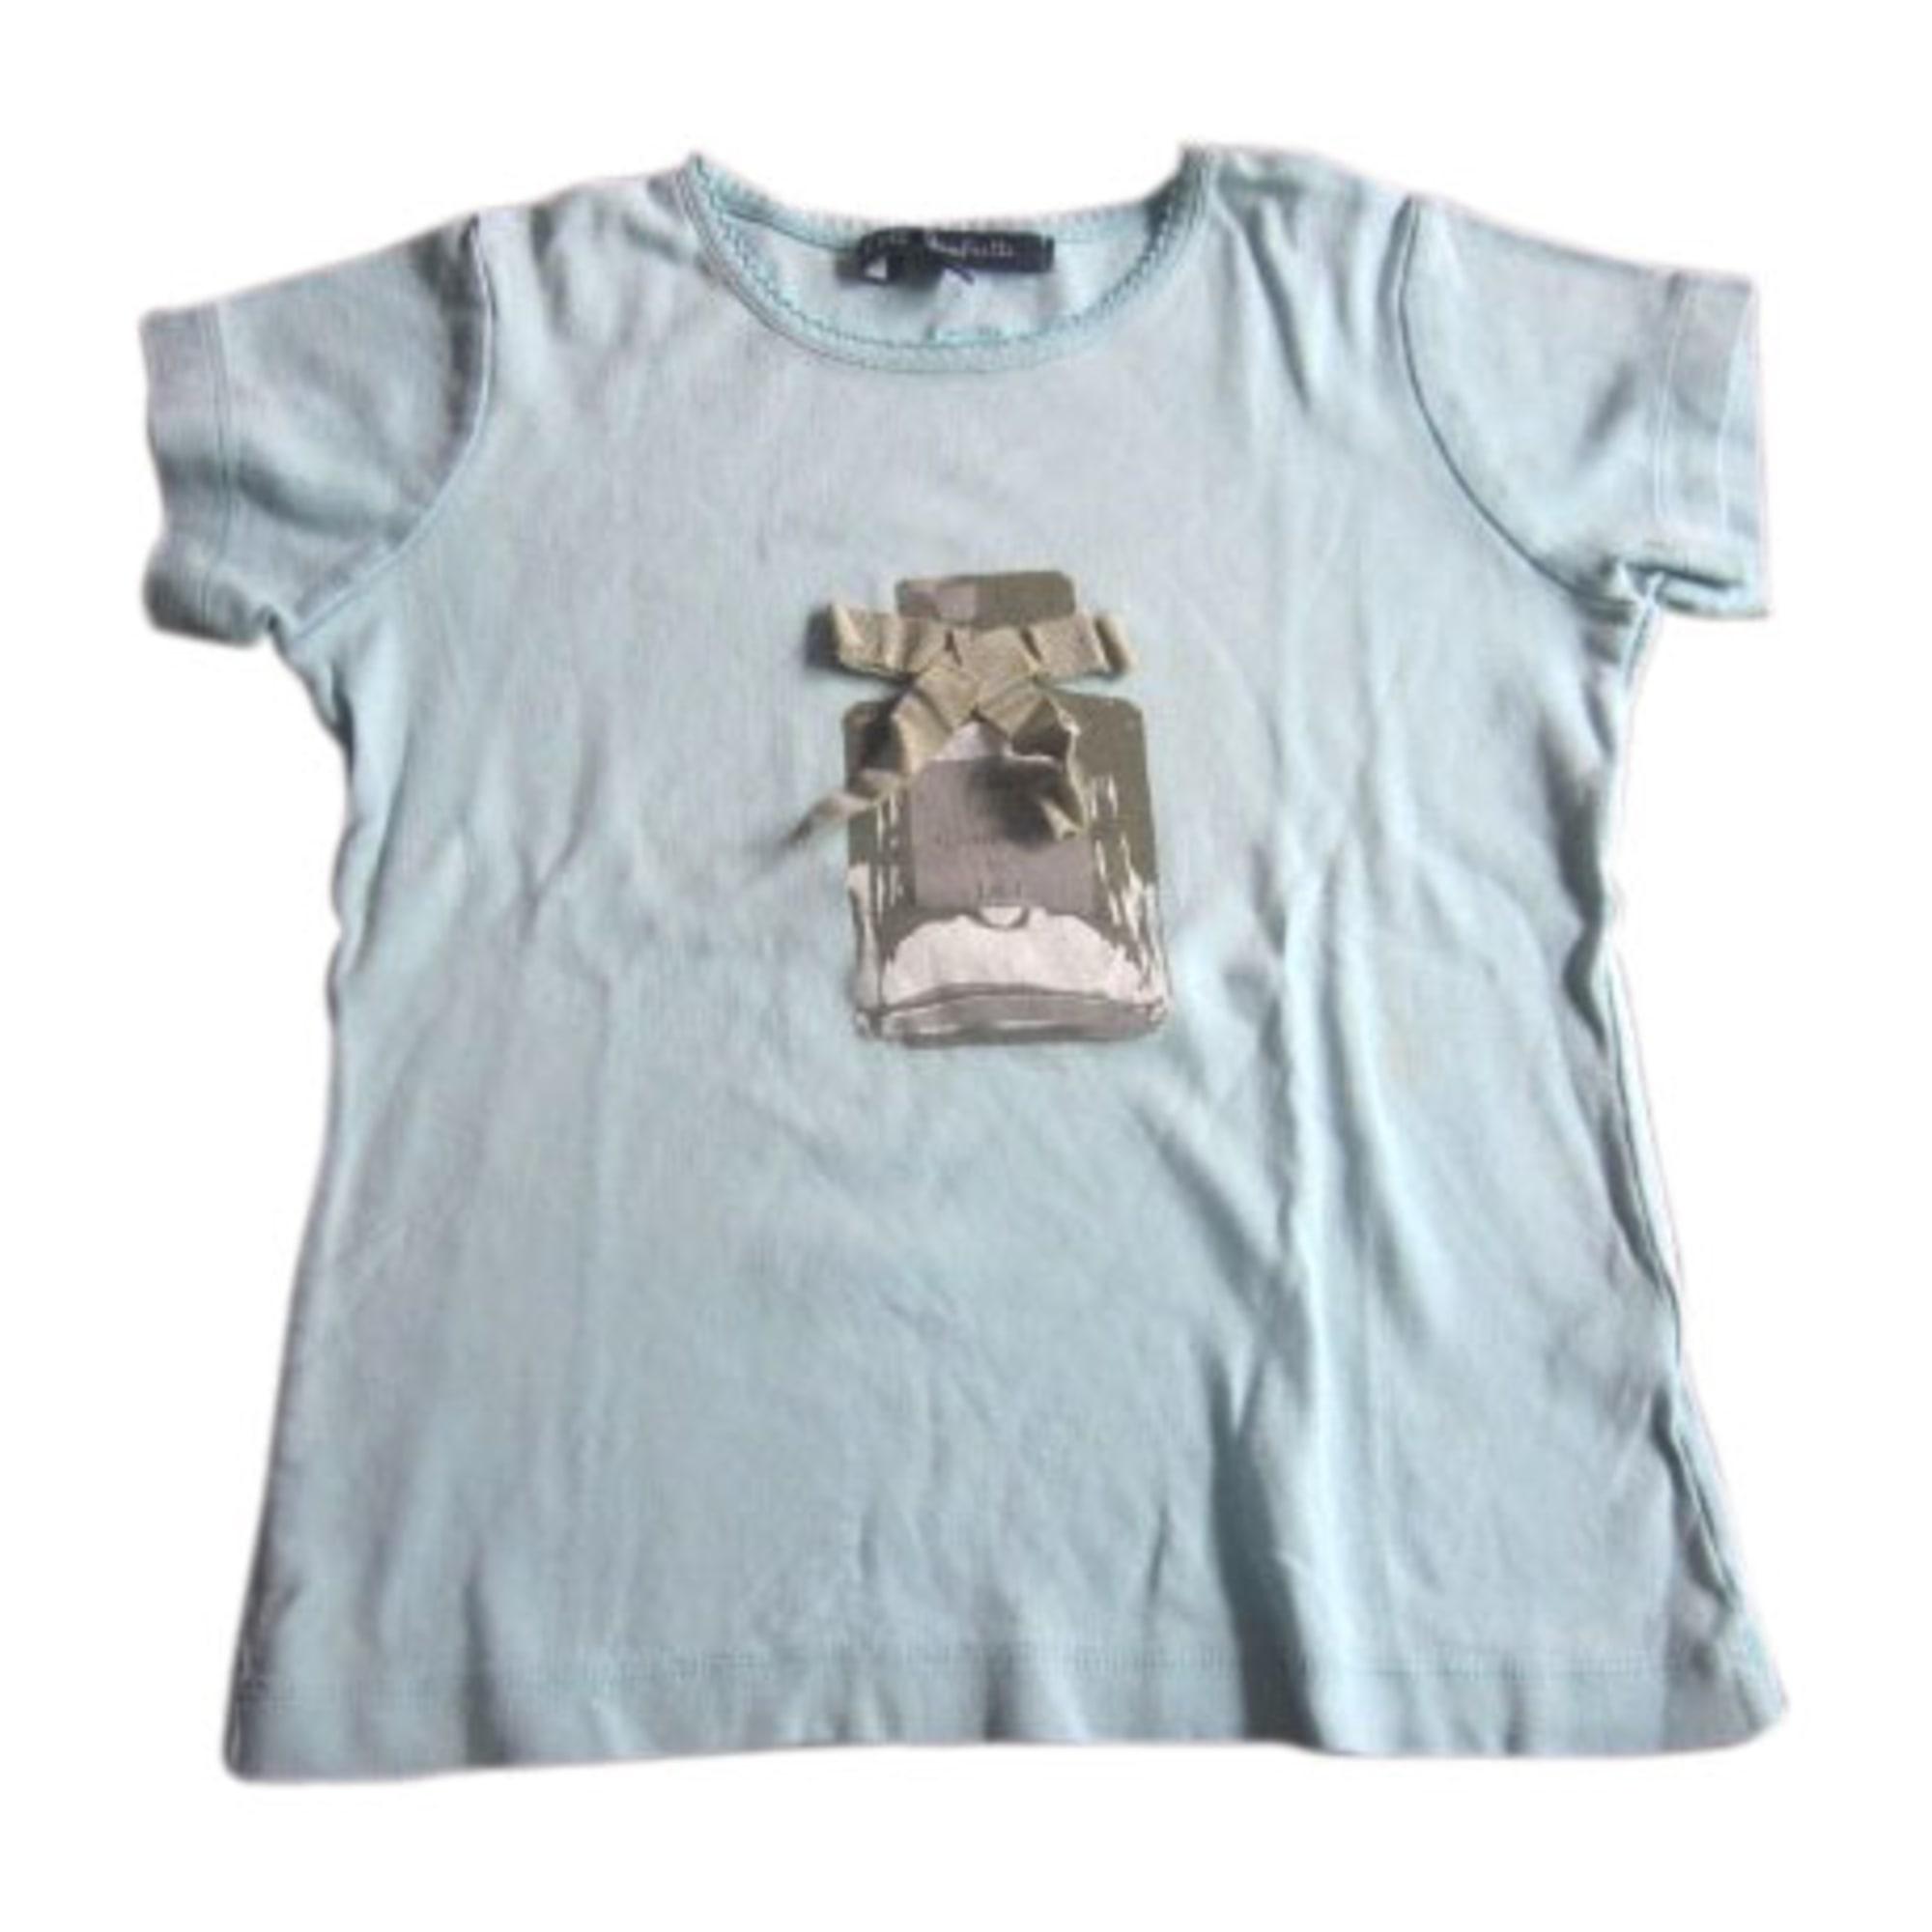 Top, Tee-shirt LILI GAUFRETTE Bleu, bleu marine, bleu turquoise